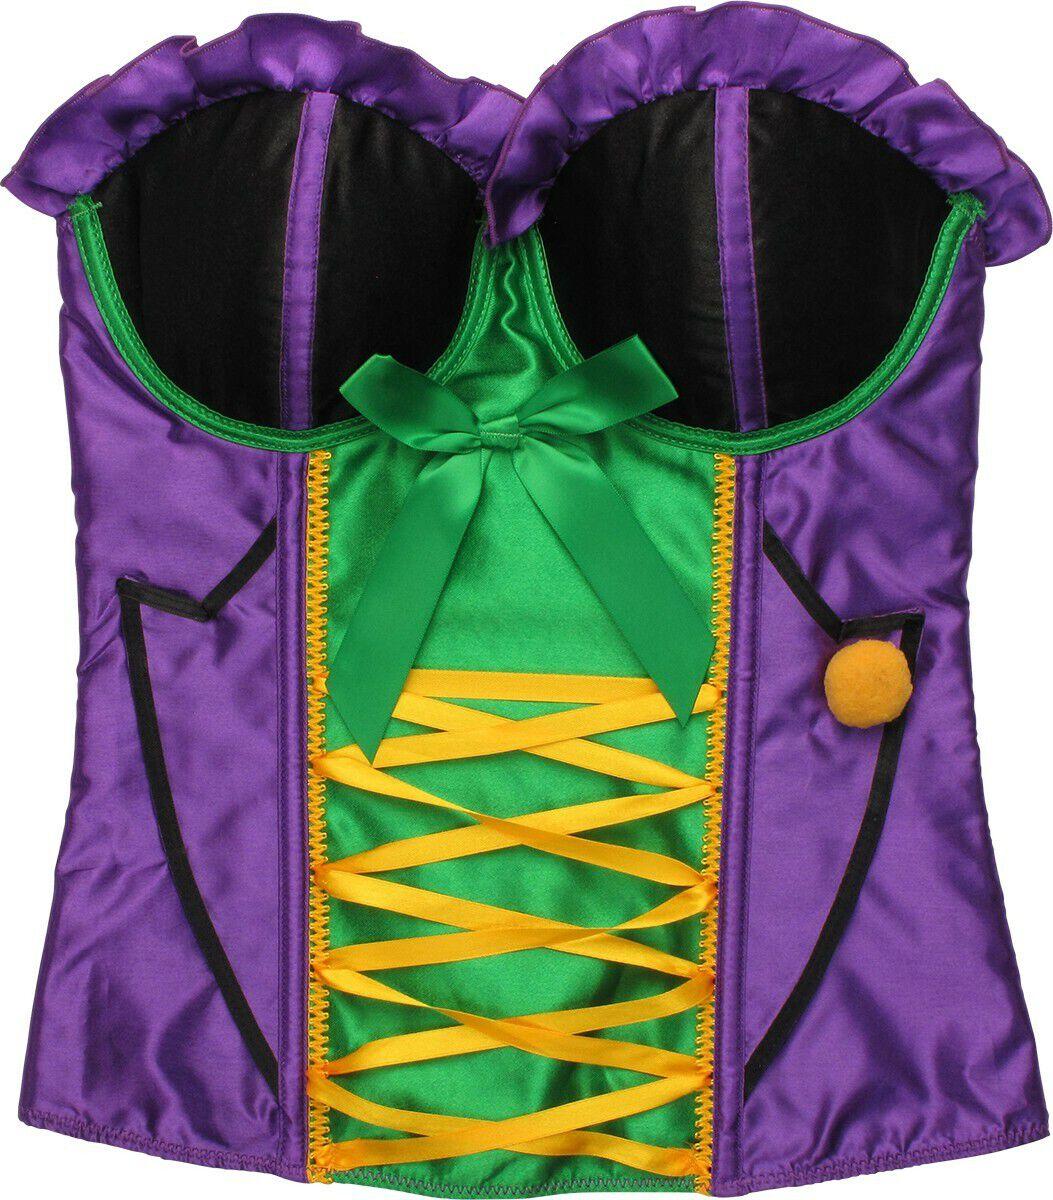 Joker Ribbon Costume Bustier